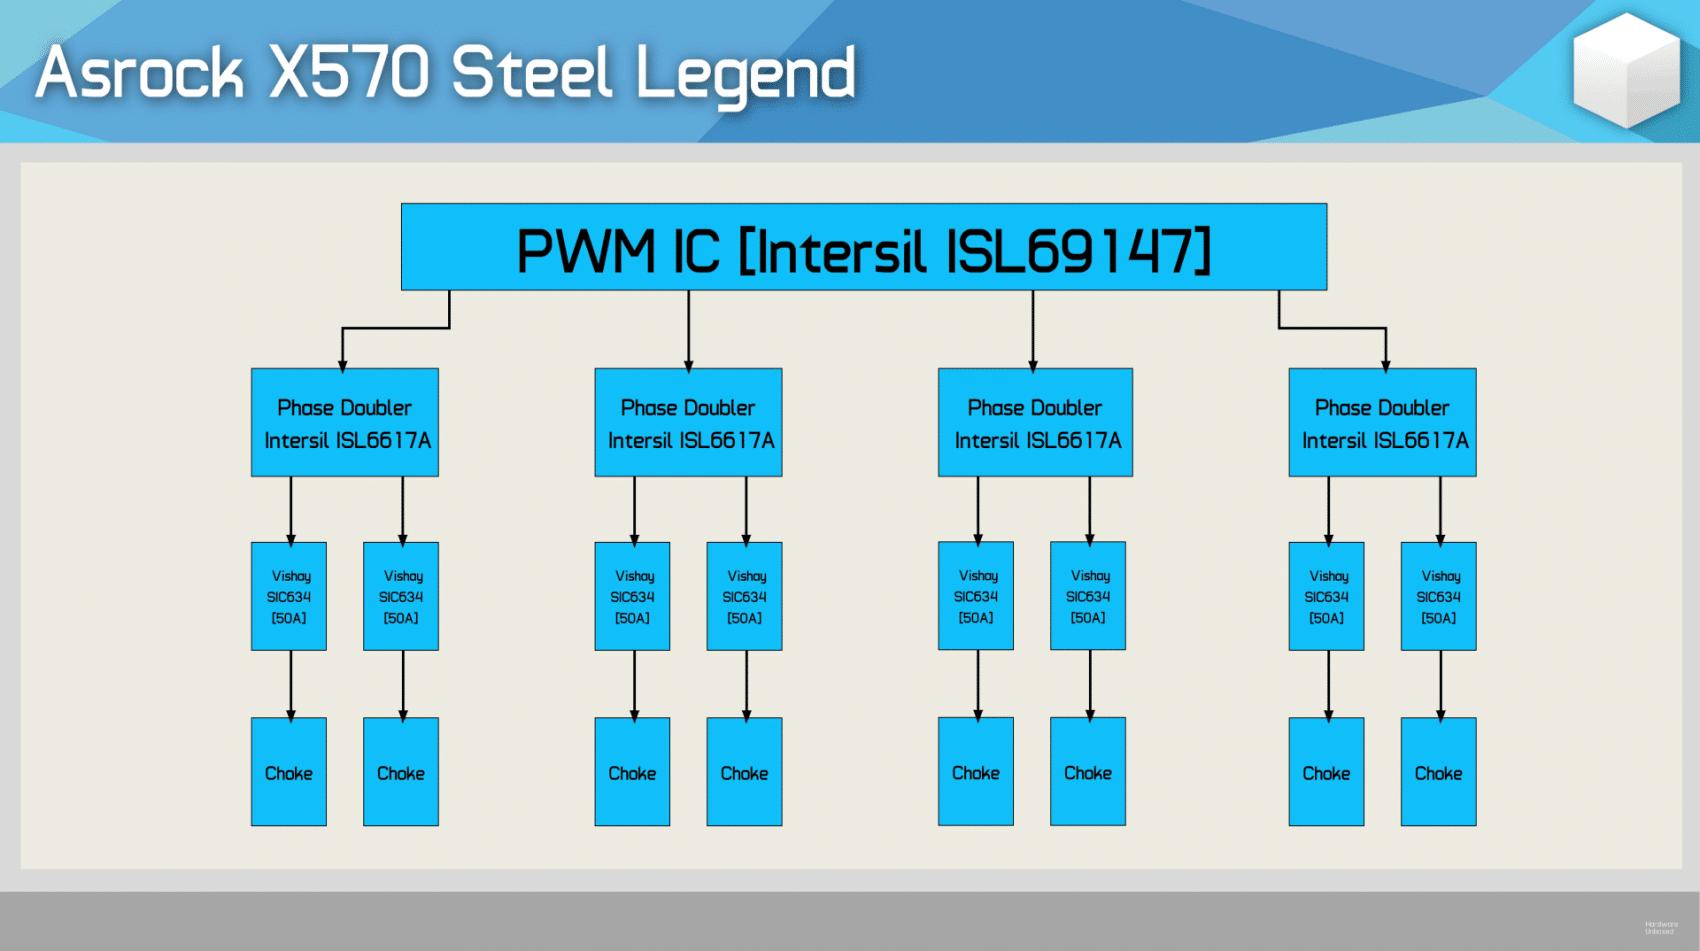 VRM ASRock X570 Steel Legend